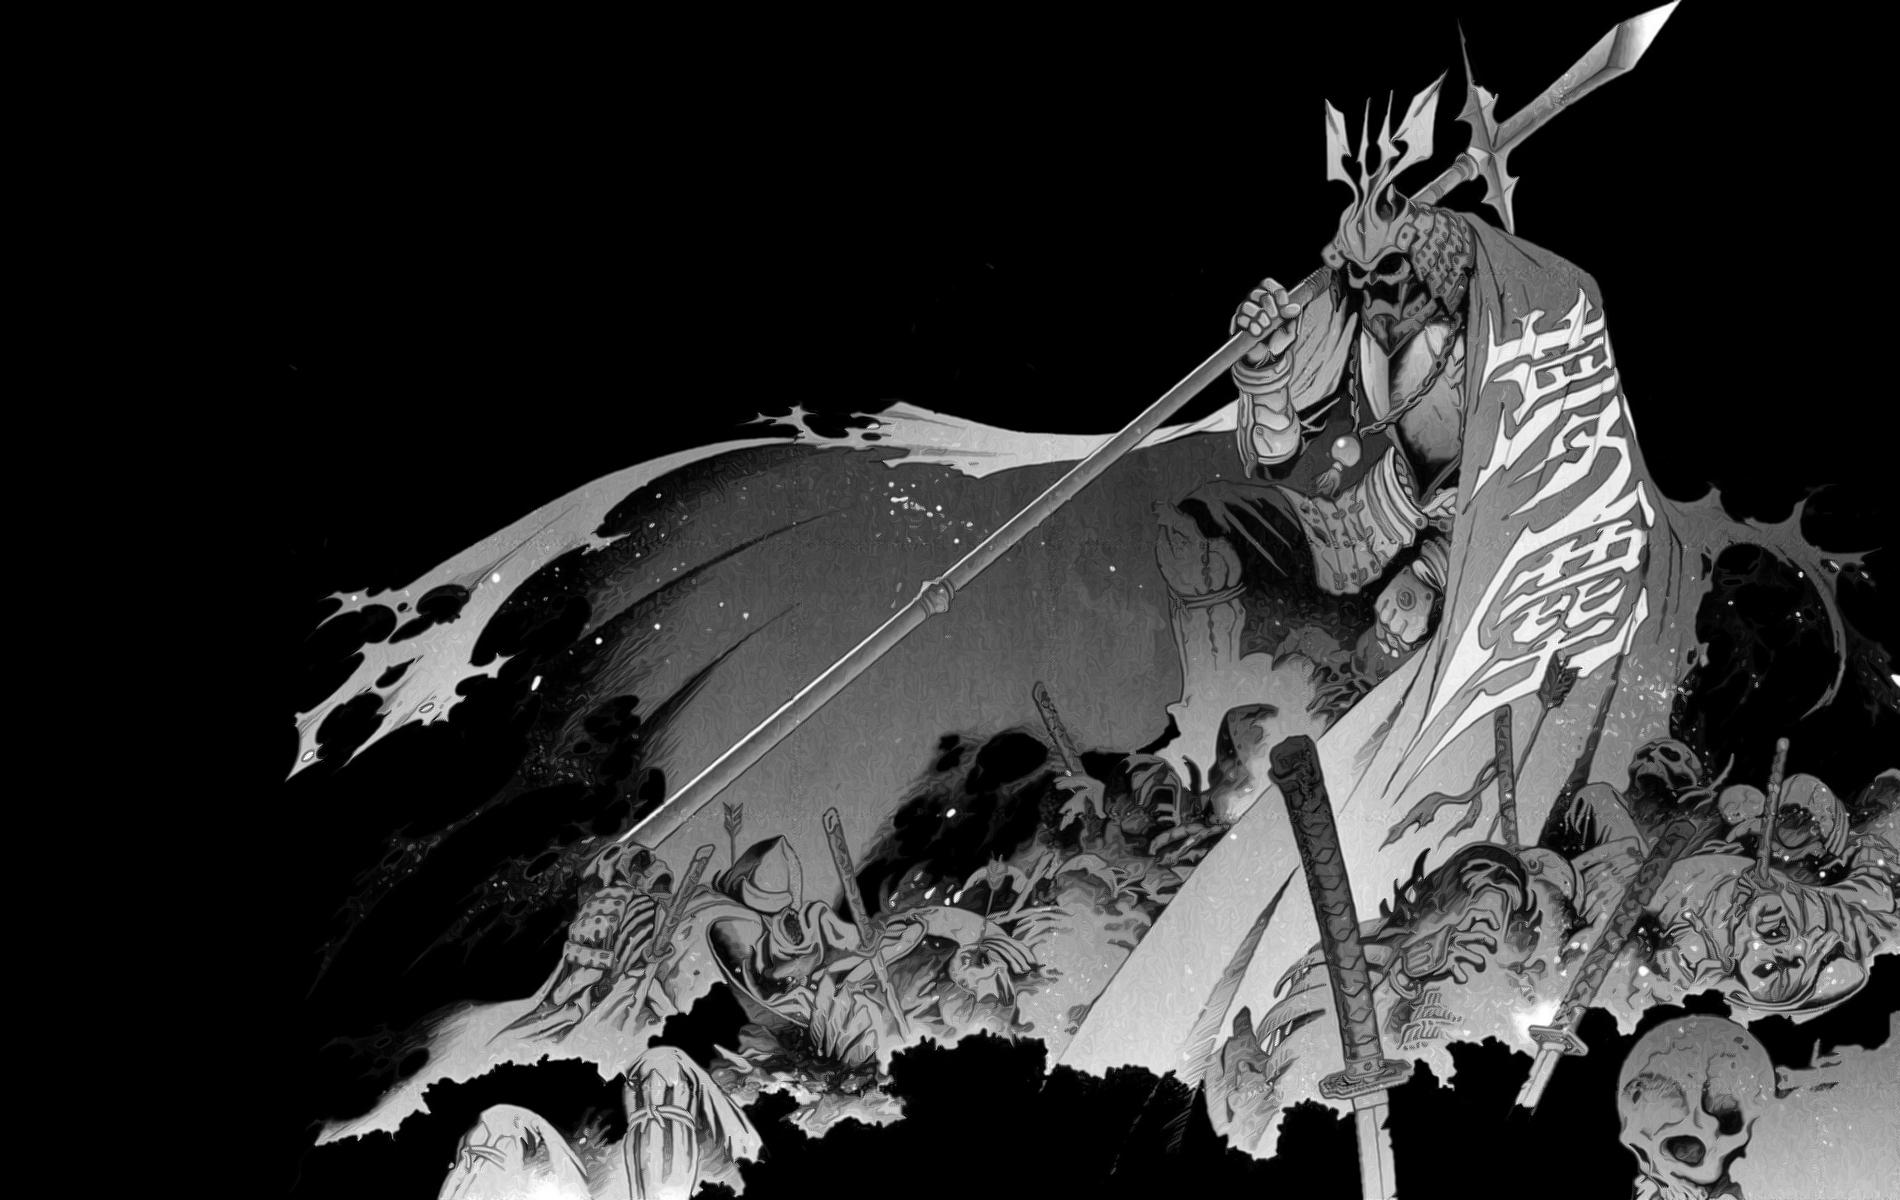 samurai bw black drawing warrior dark skulls warrior